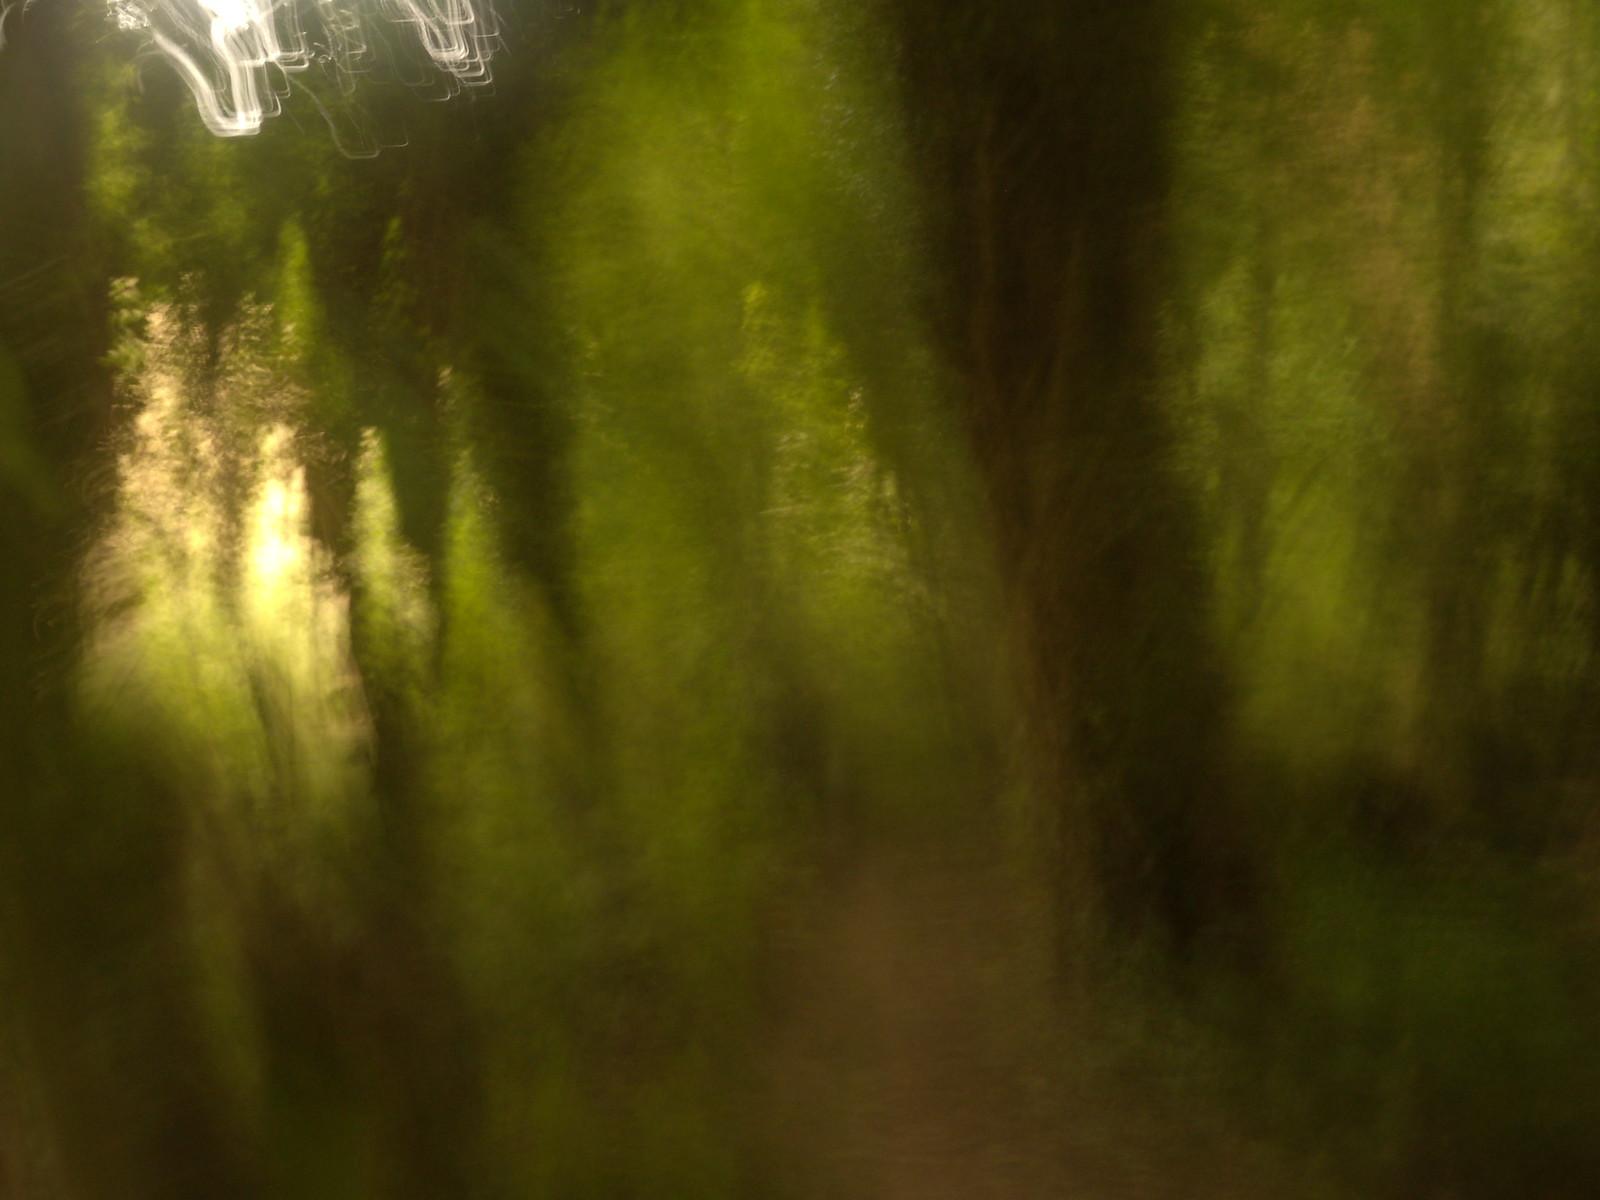 Trees Hassocks to Brighton